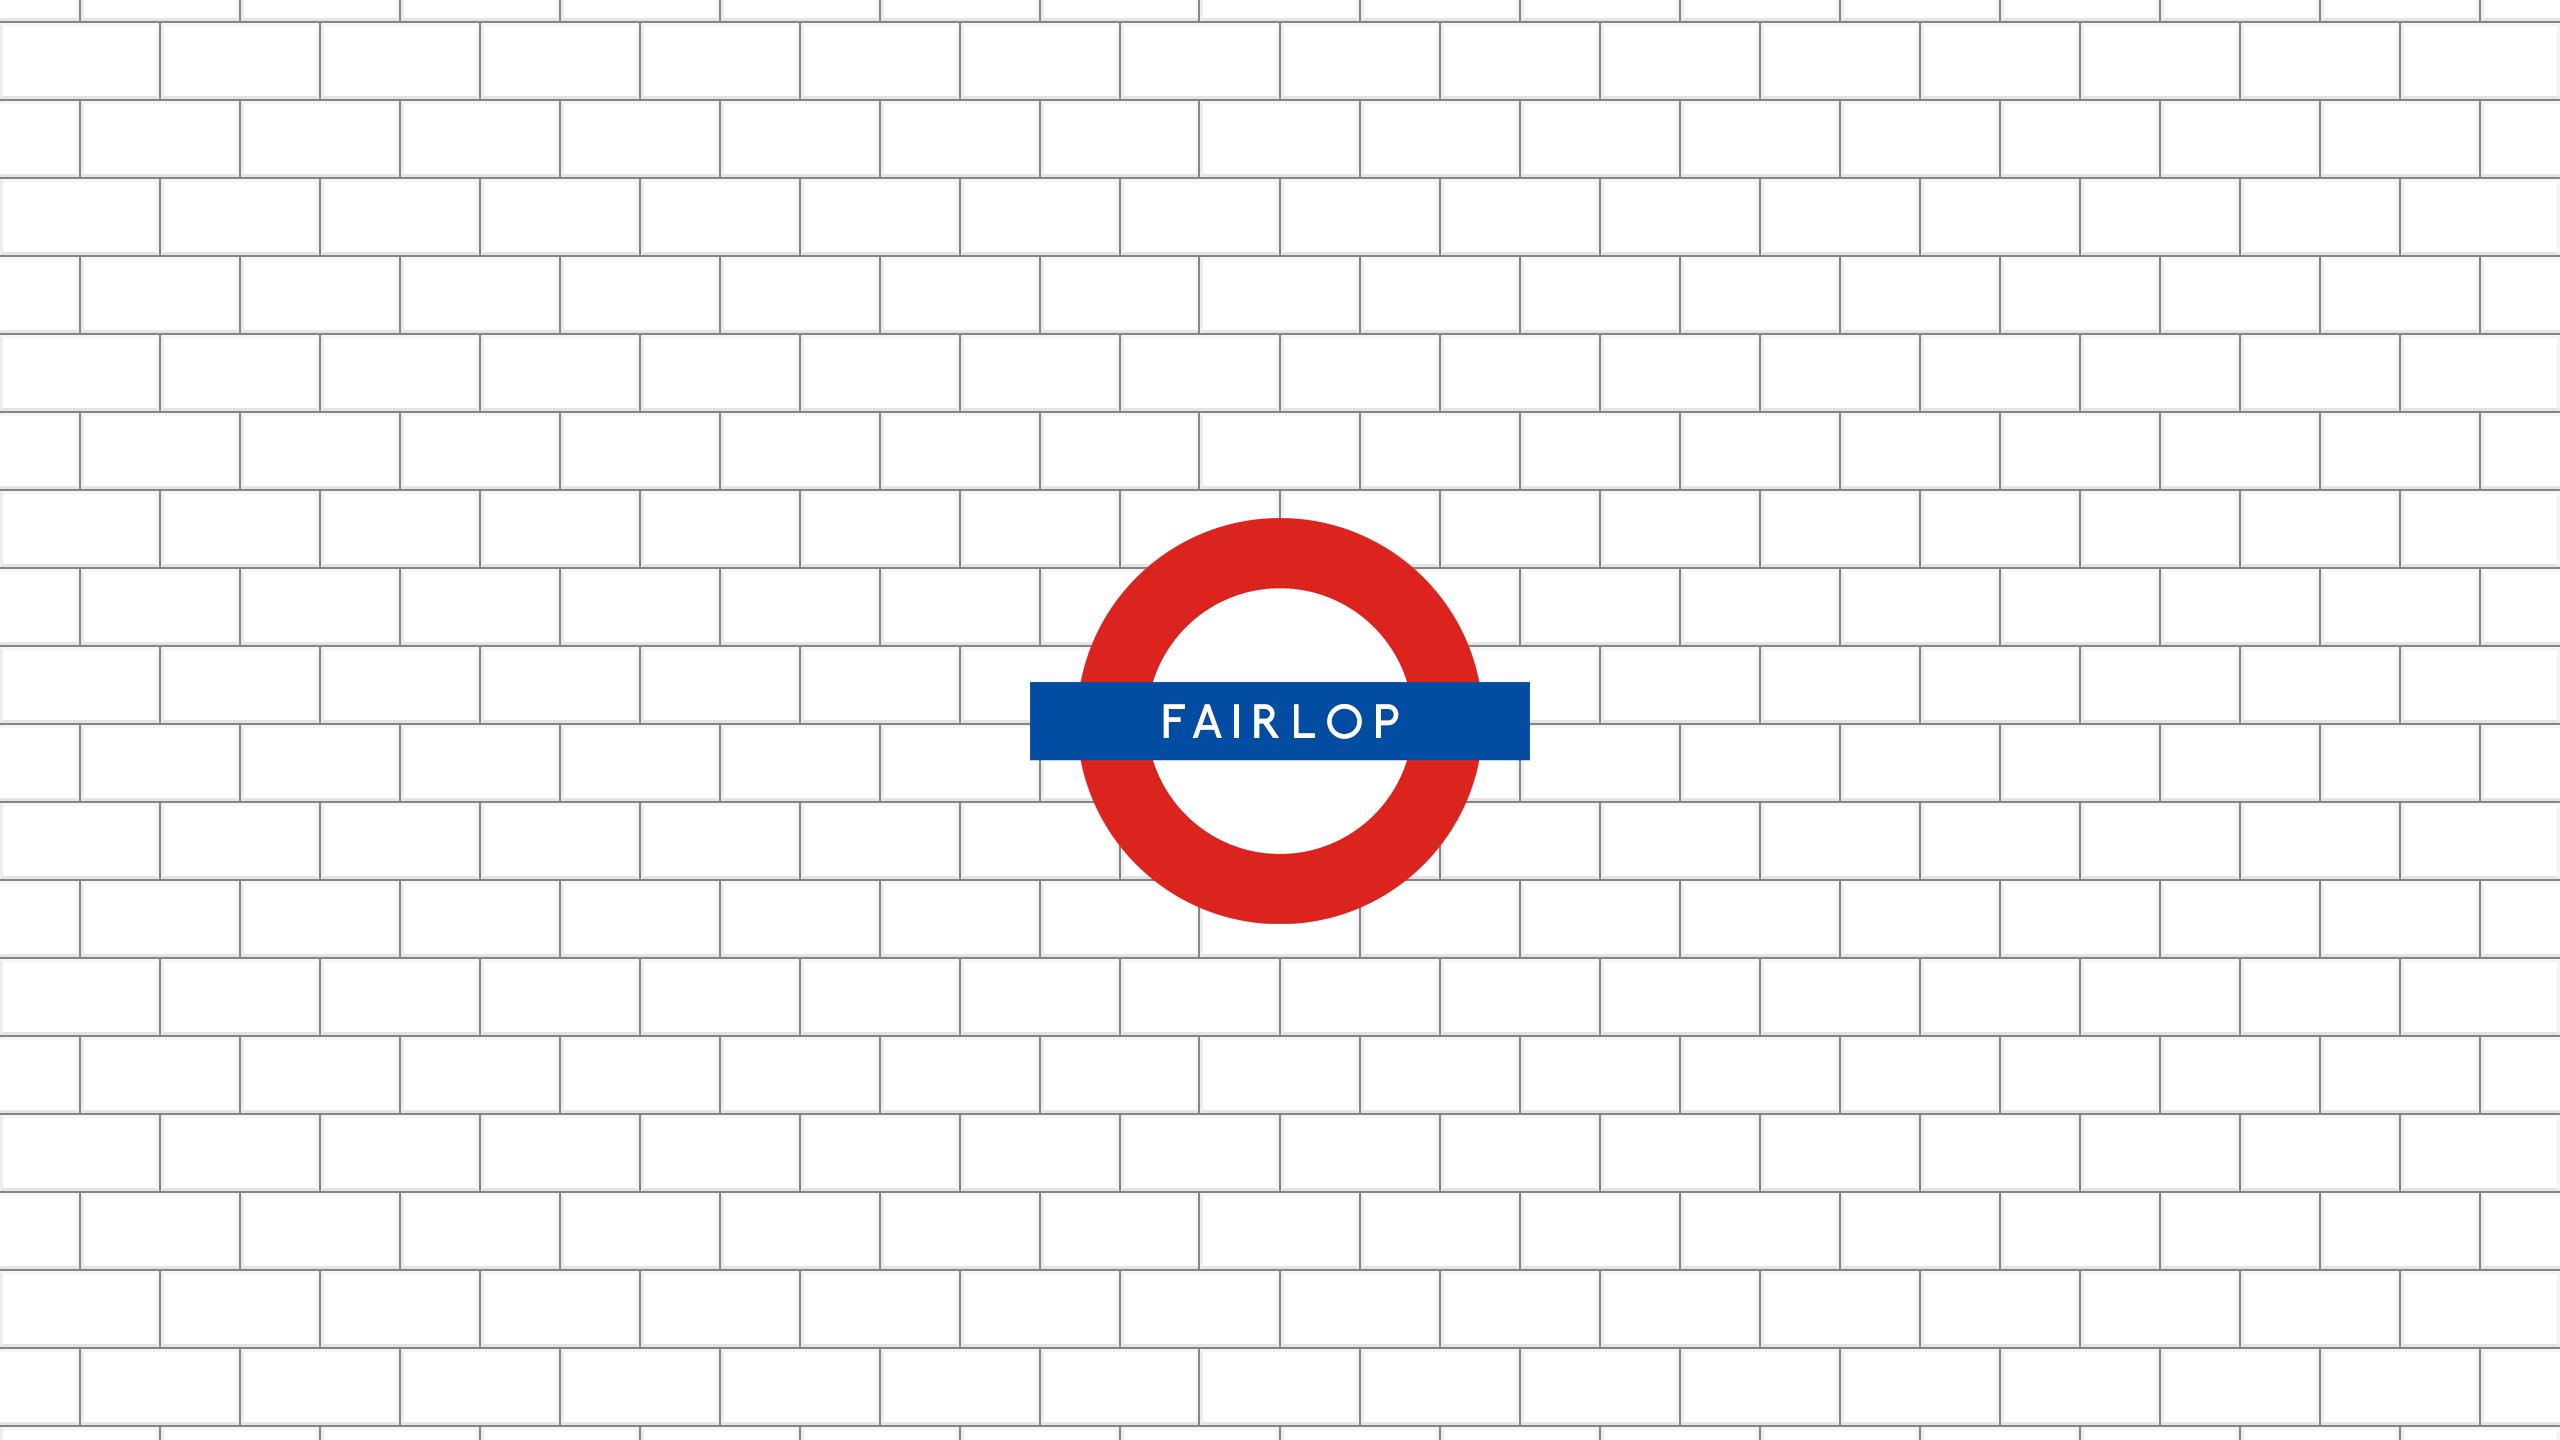 Fairlop